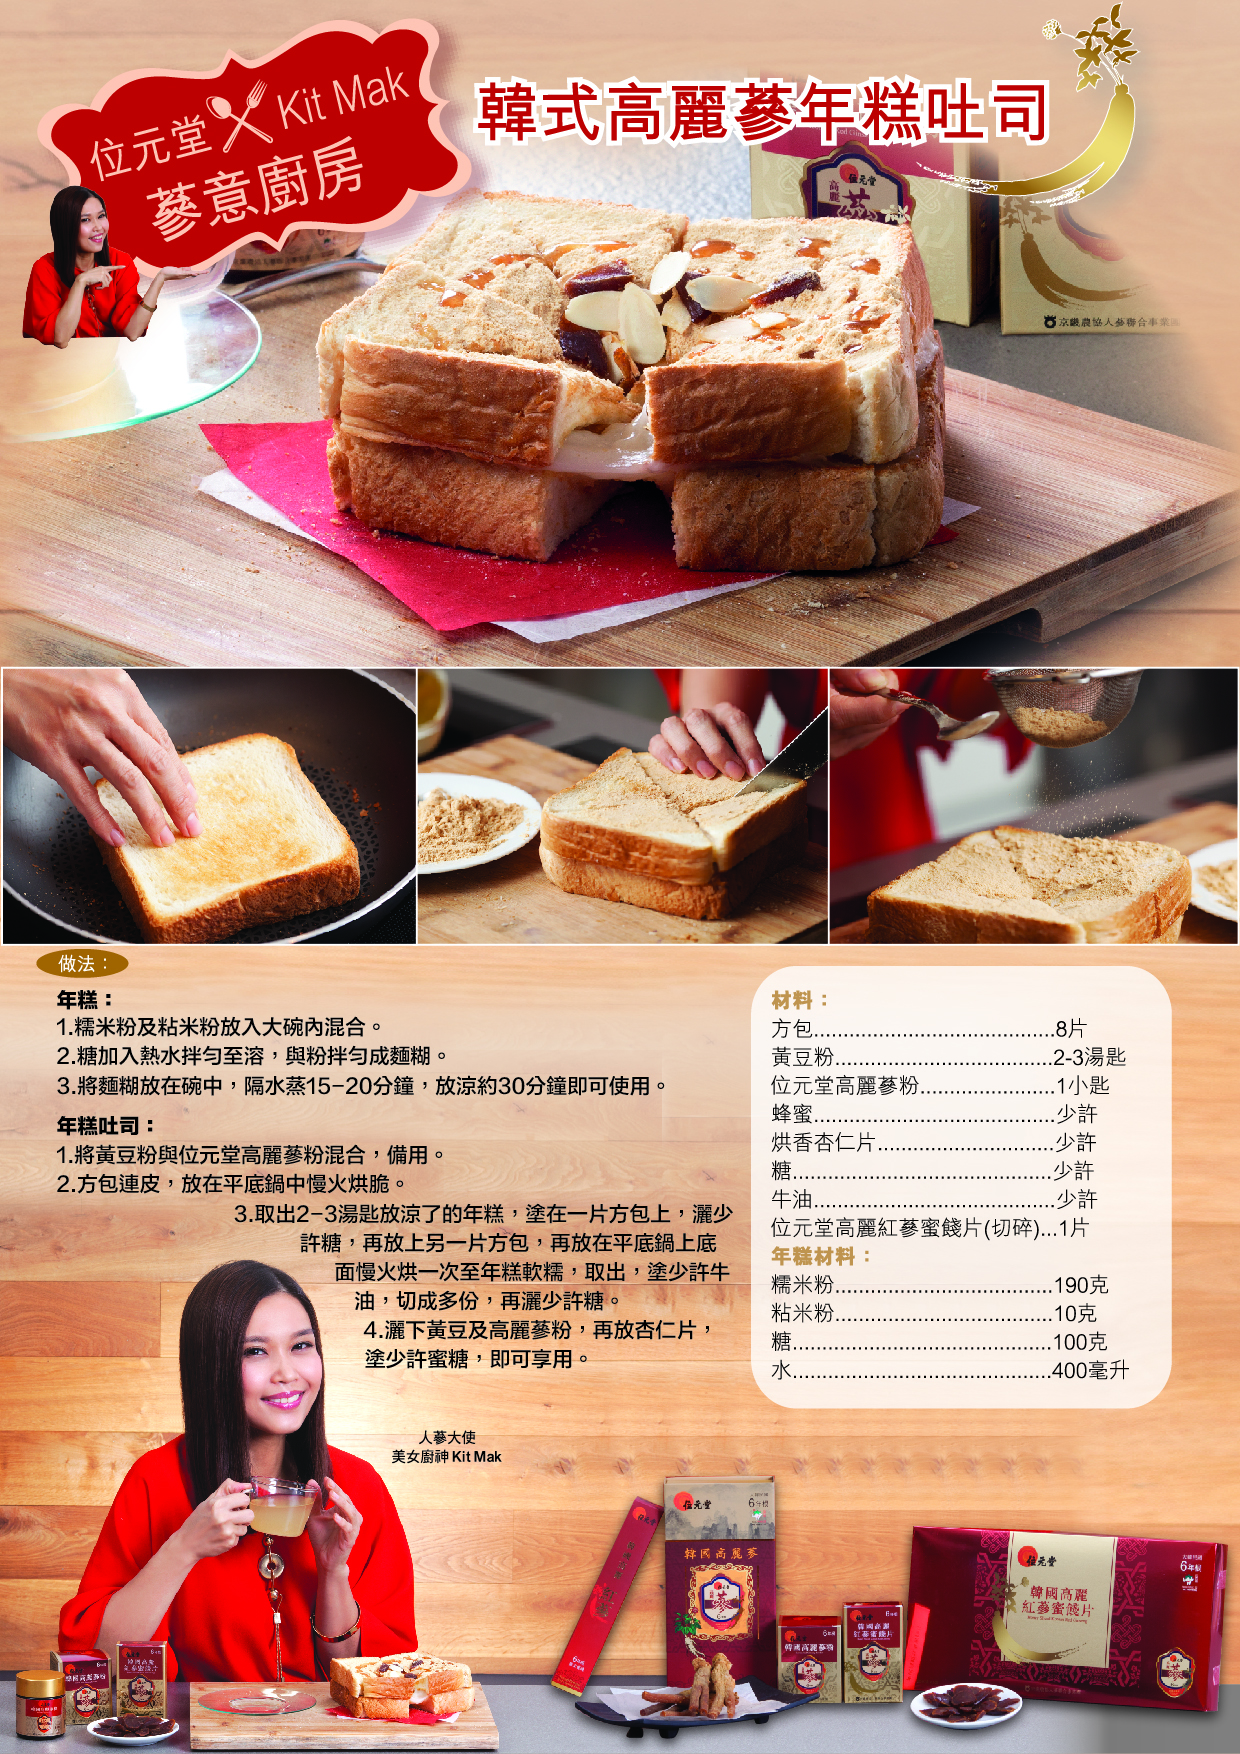 Receipe_高元蔘籠仔雞燉黃金飯_Outline